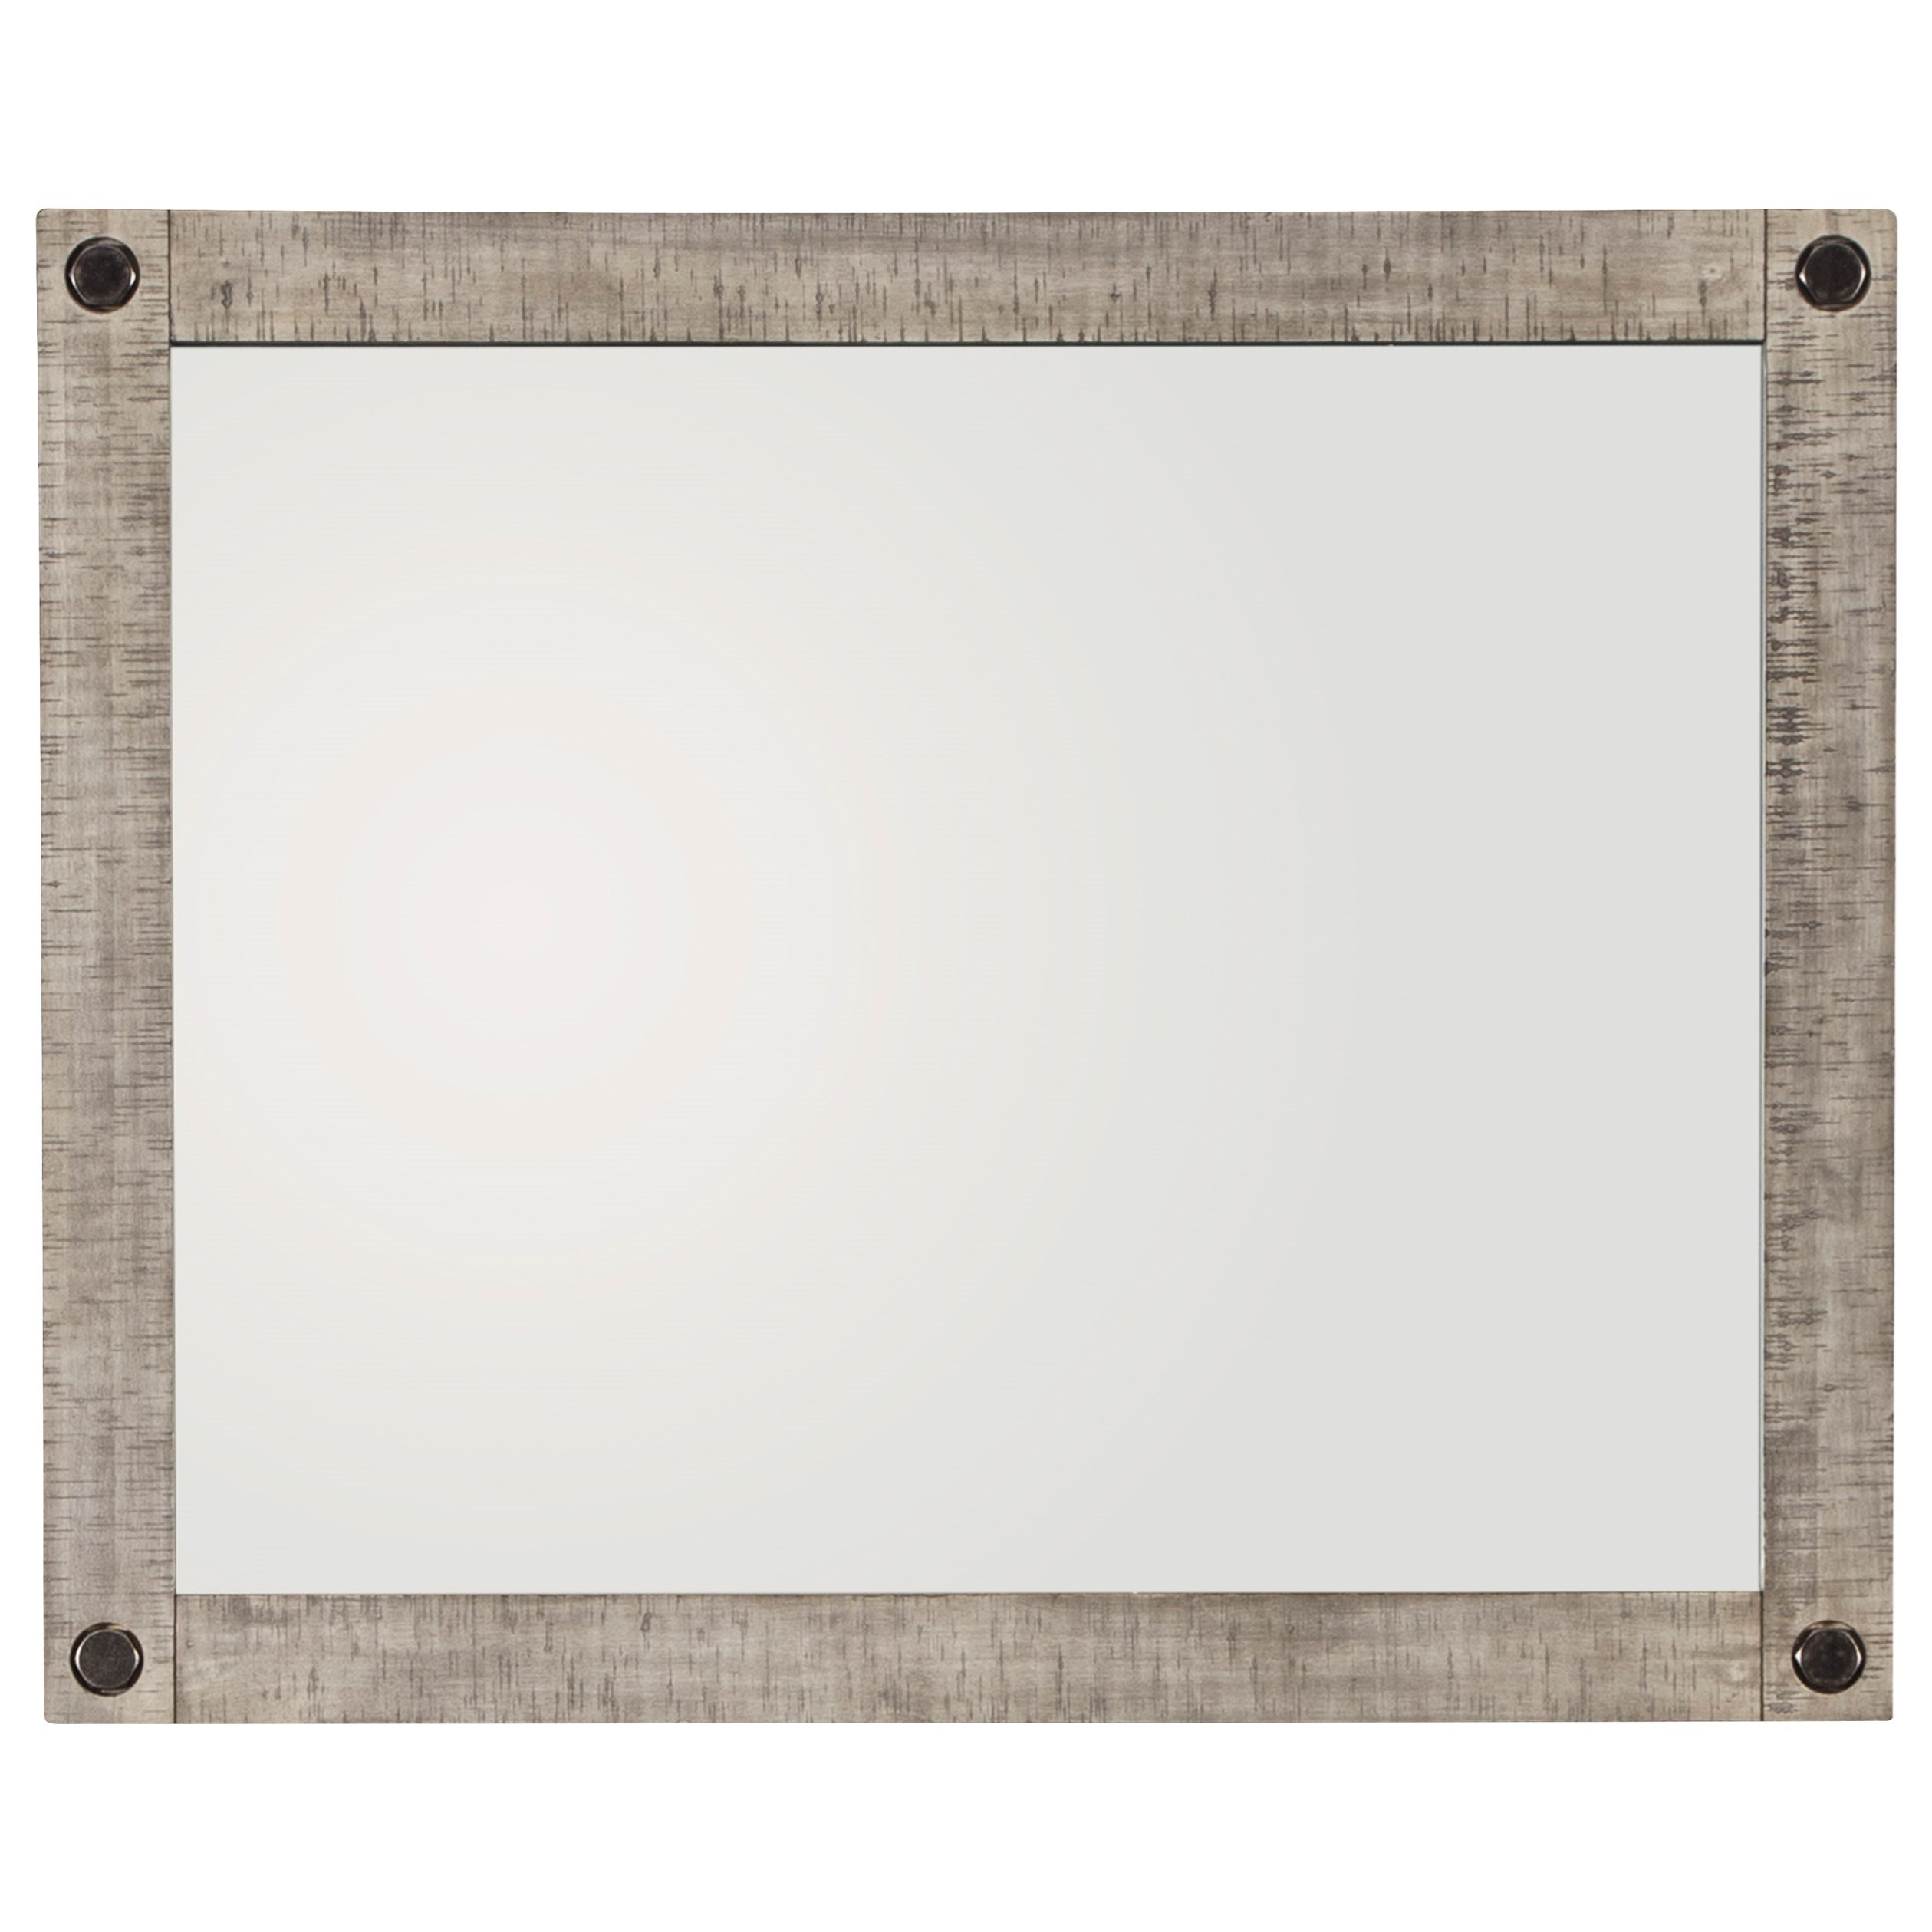 Naydell Bedroom Mirror by Benchcraft at Walker's Furniture